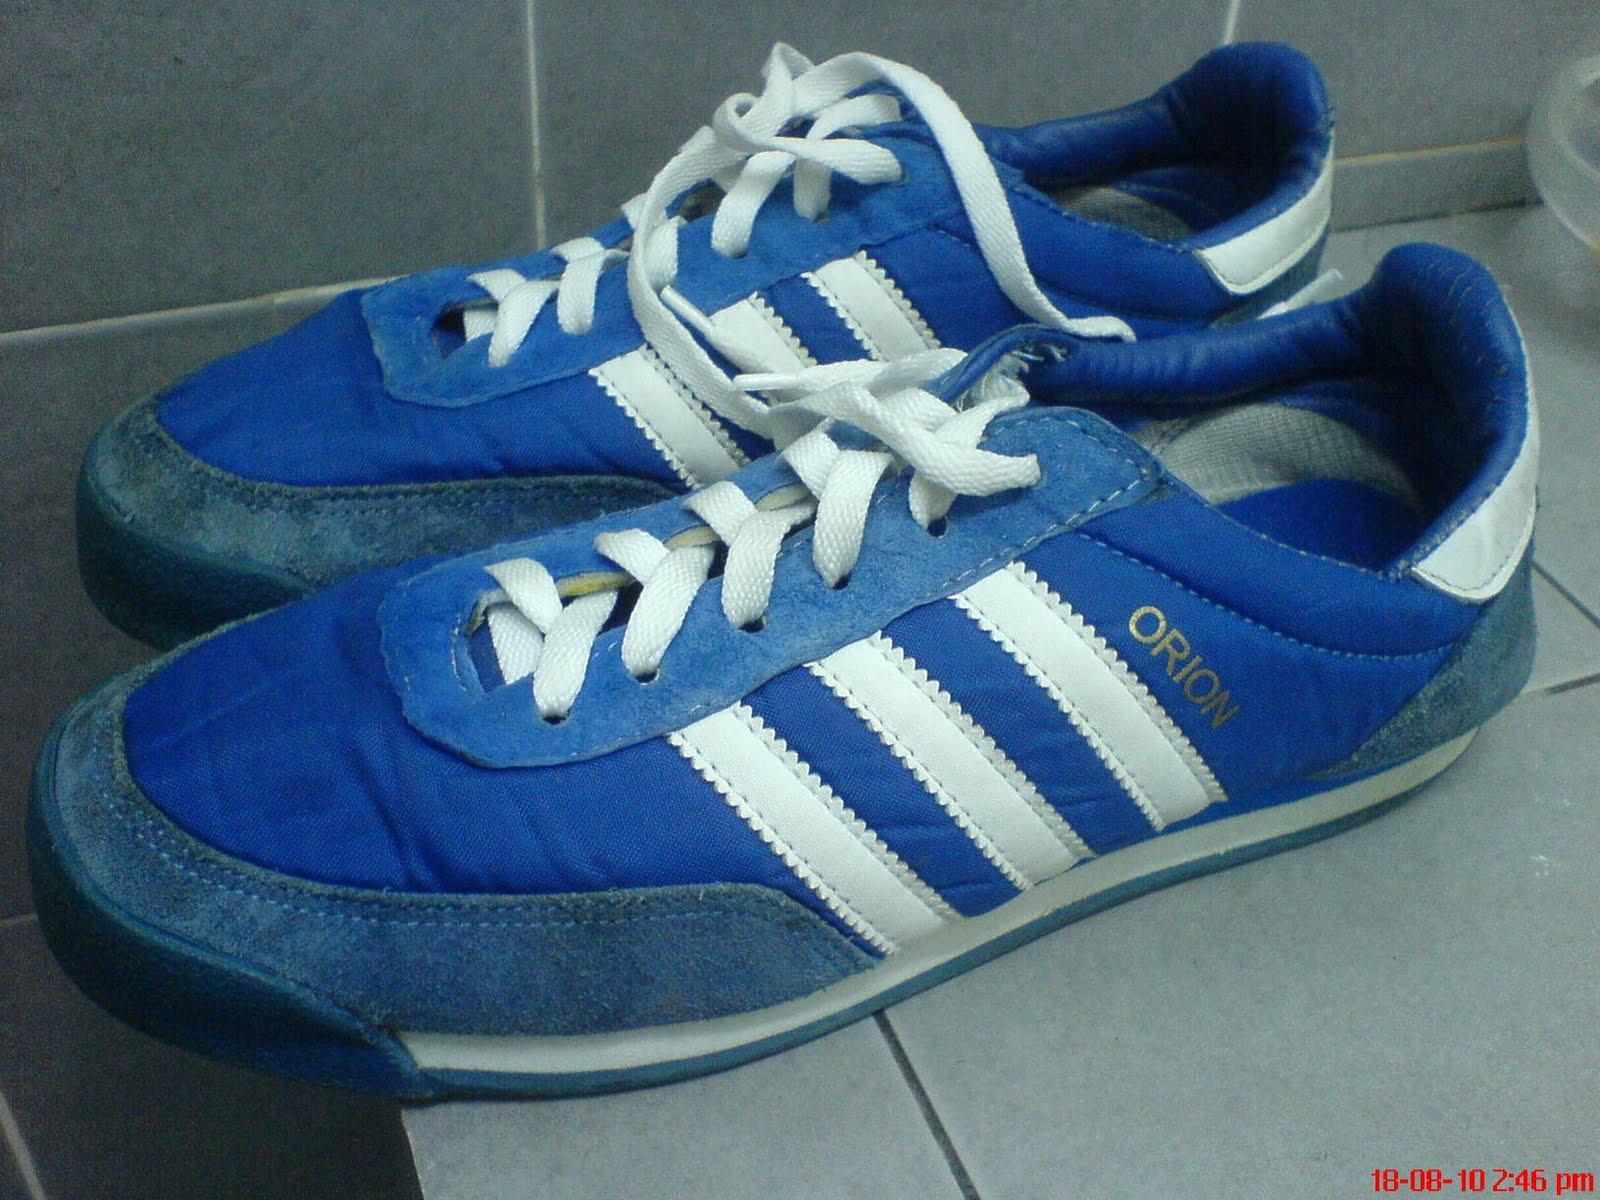 PLANET VINTAGE: Vintage adidas orion shoes (SOLD)